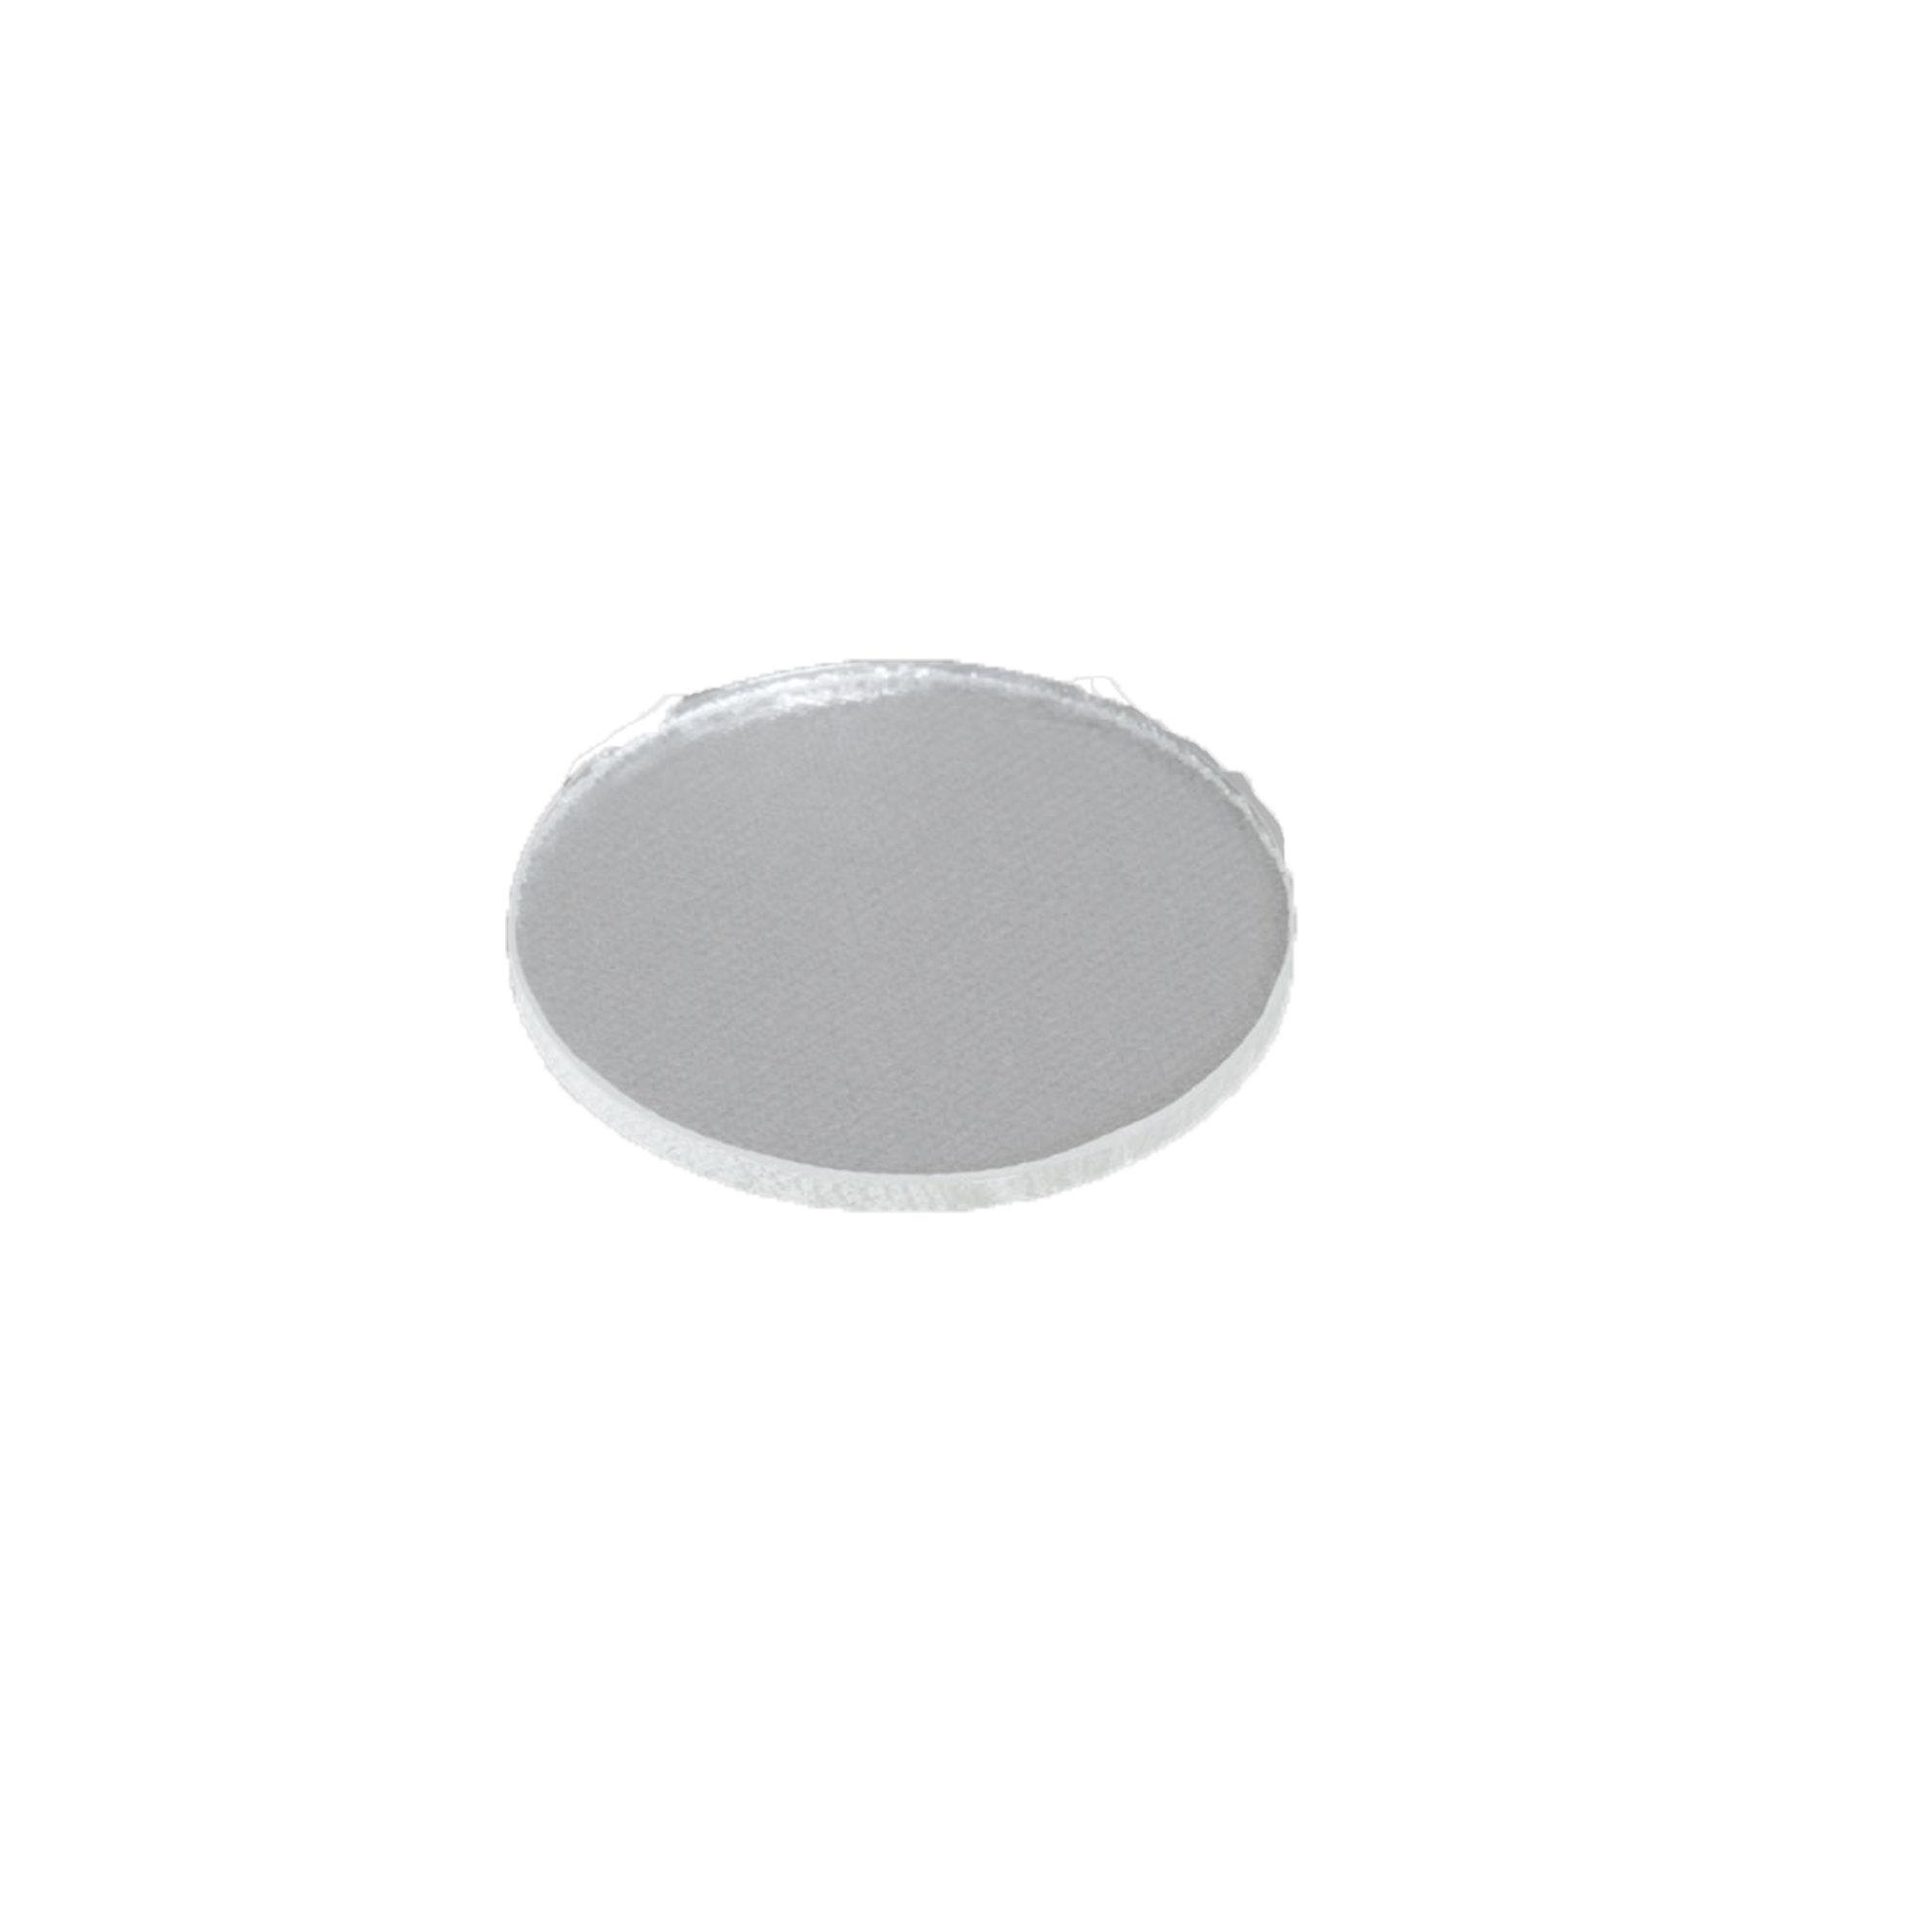 Vorsa 20 Linear Spreader Lens Ø17.5mm